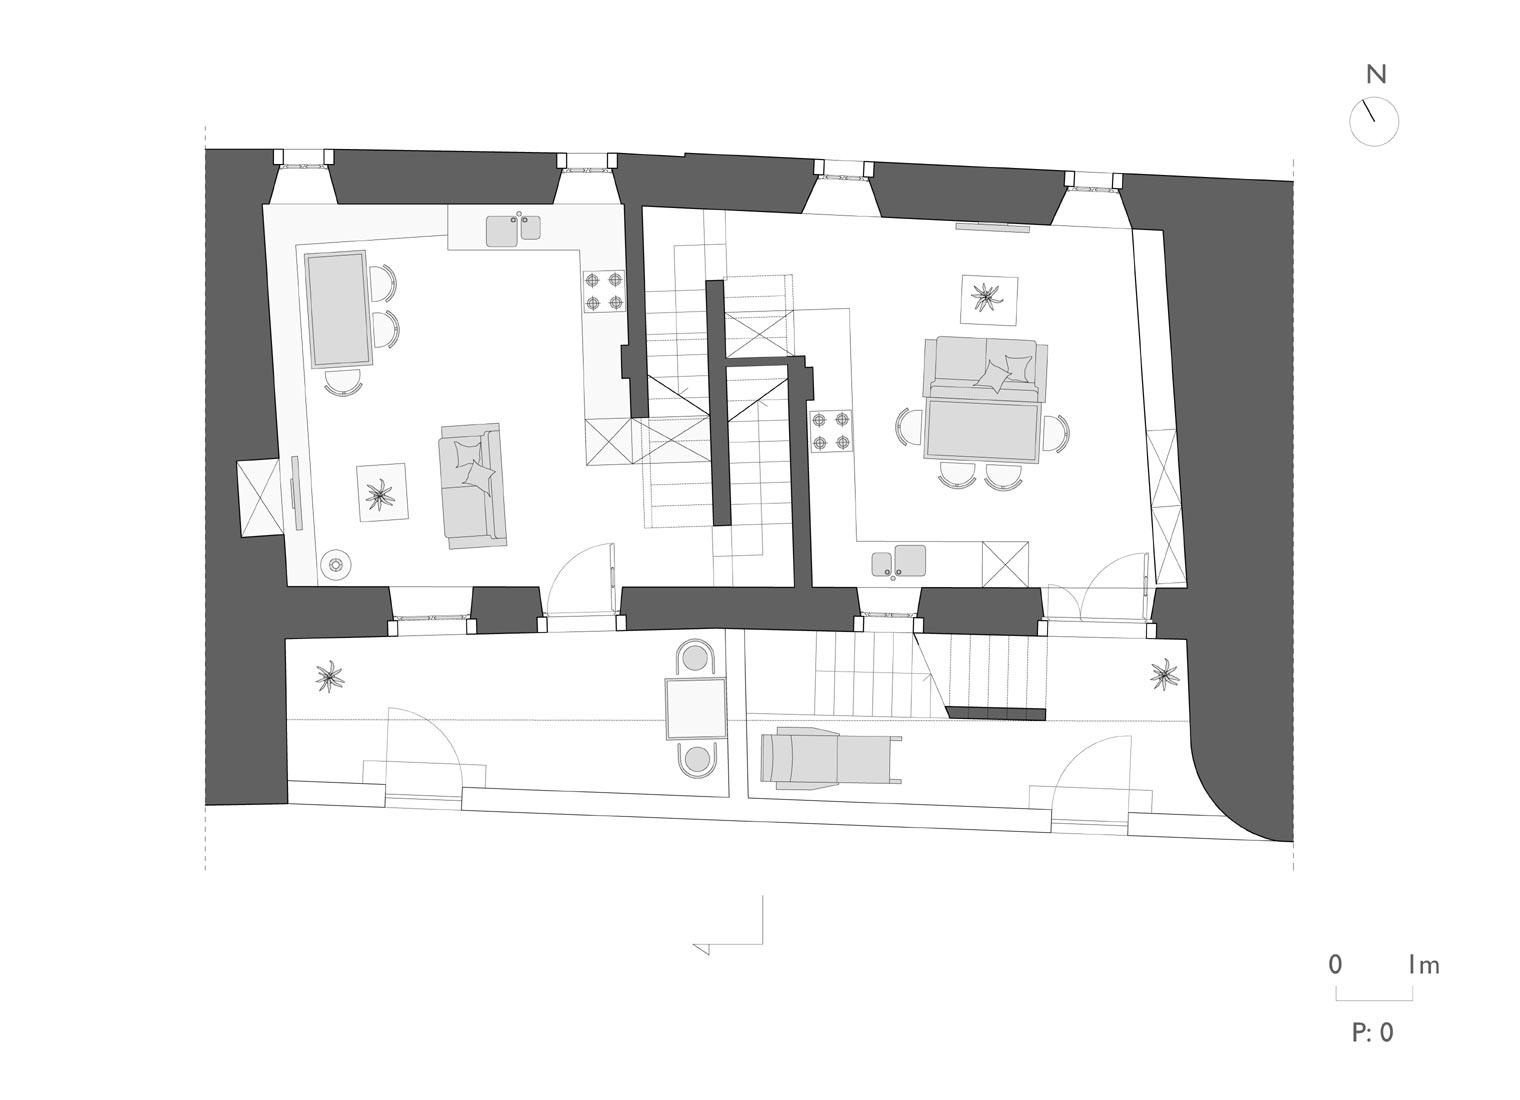 vk-architetti_romeo_juliet_plan0